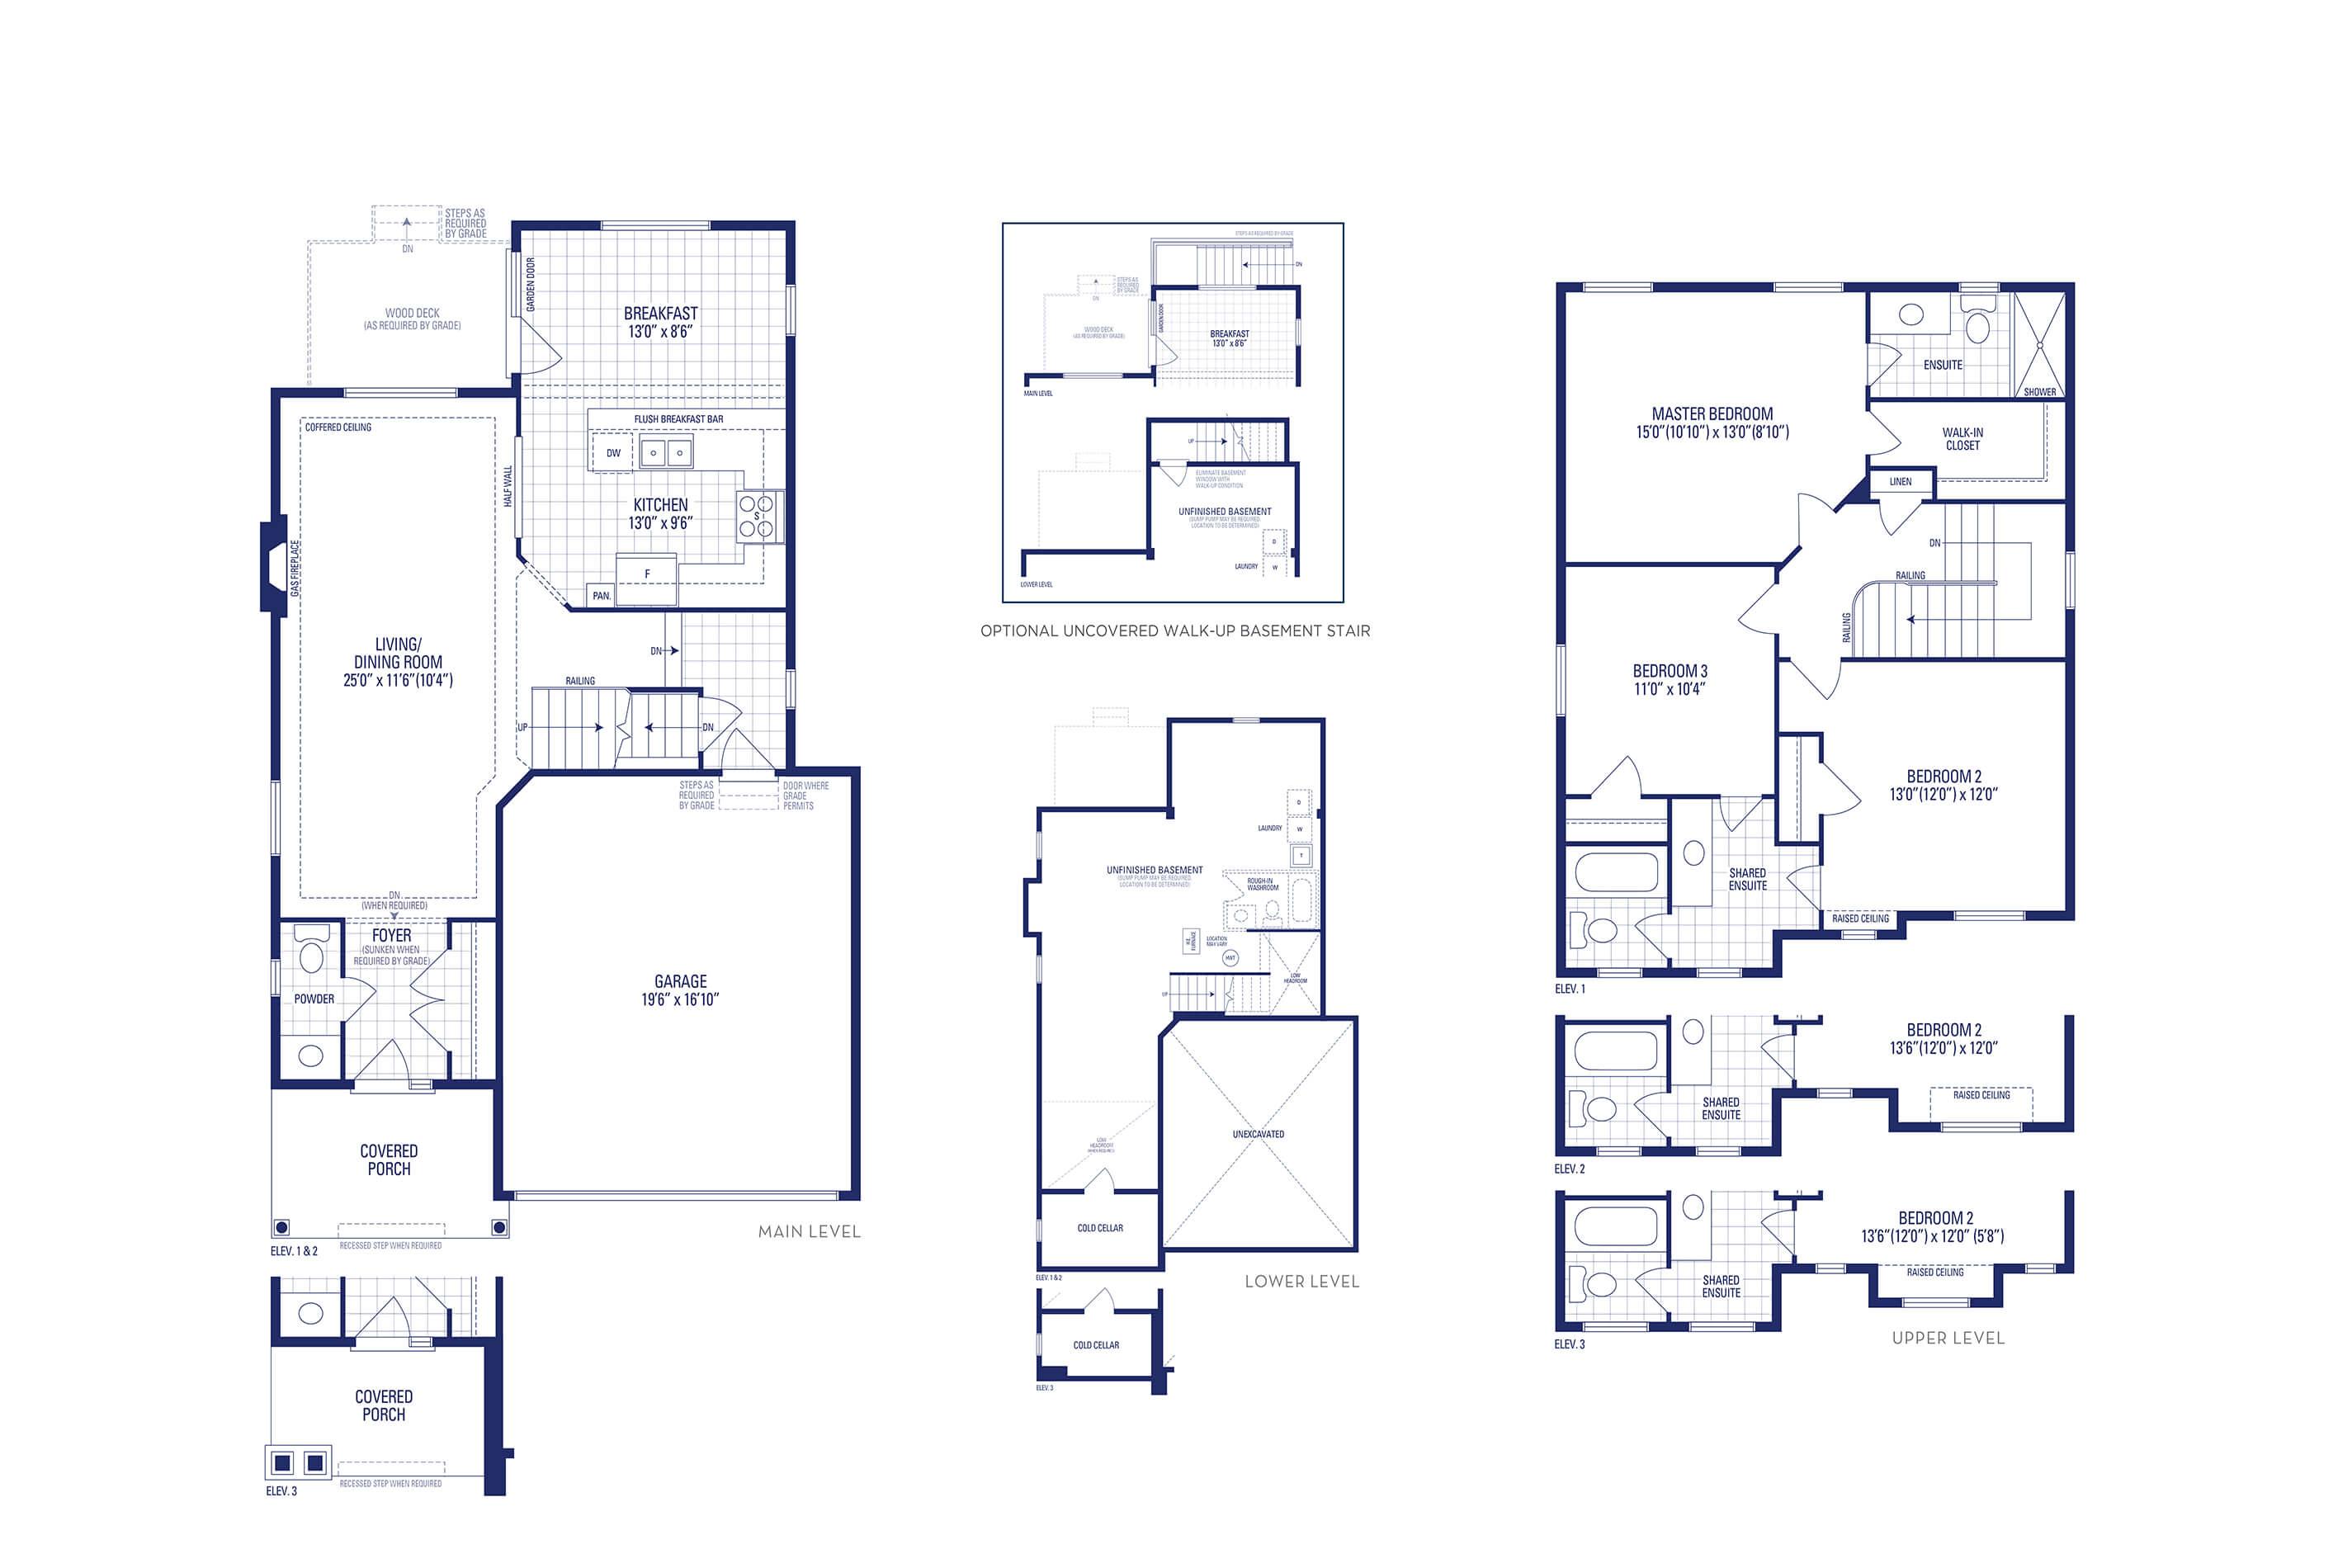 Jersey 01 Elev. 1 Floorplan